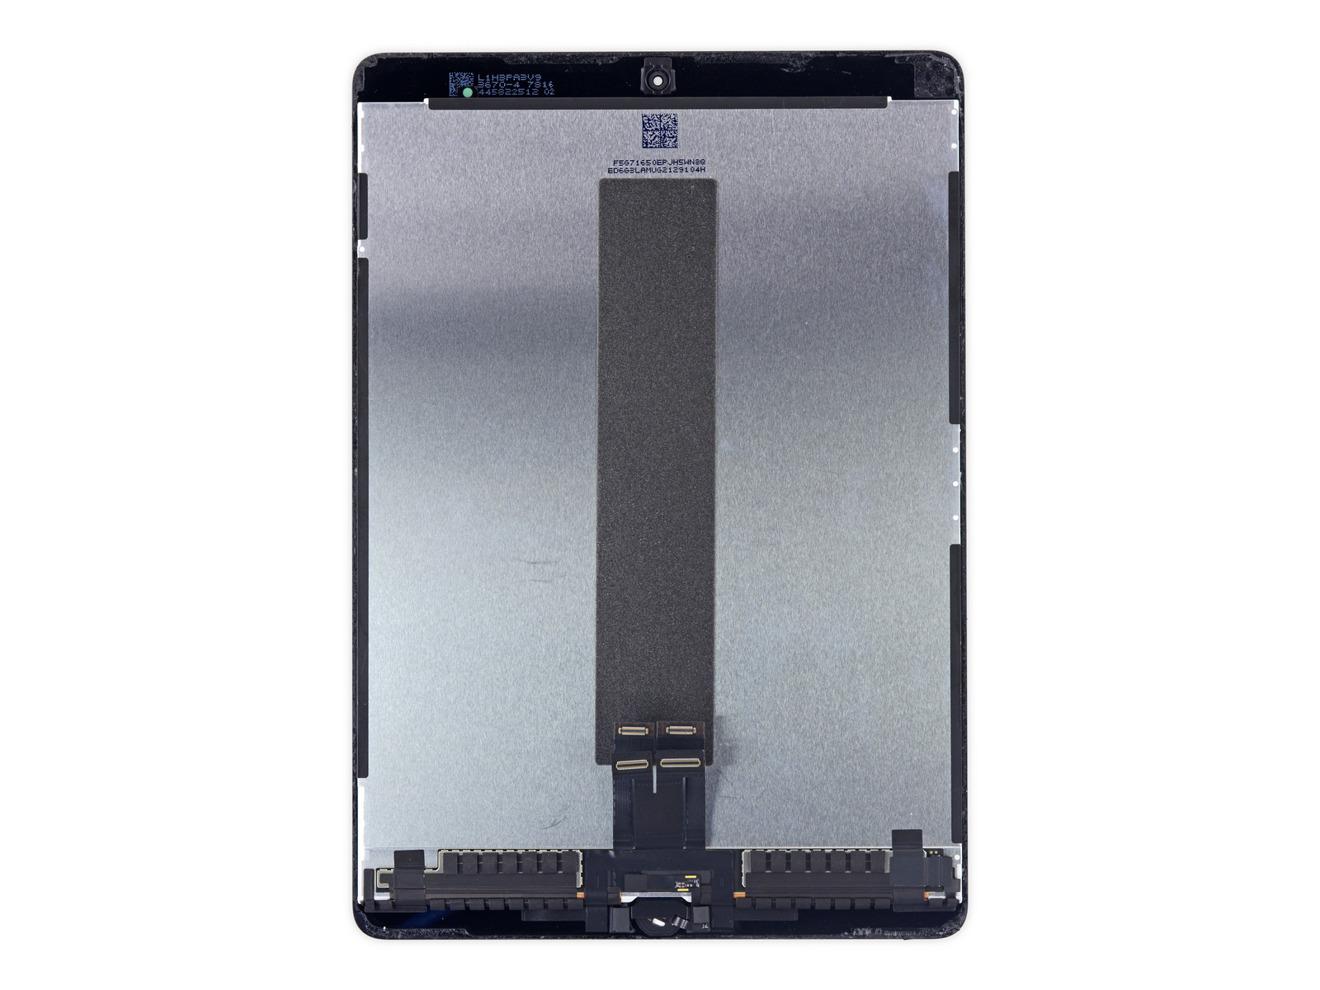 "10.5"" iPad Pro teardown finds Apple's 120Hz ProMotion ..."